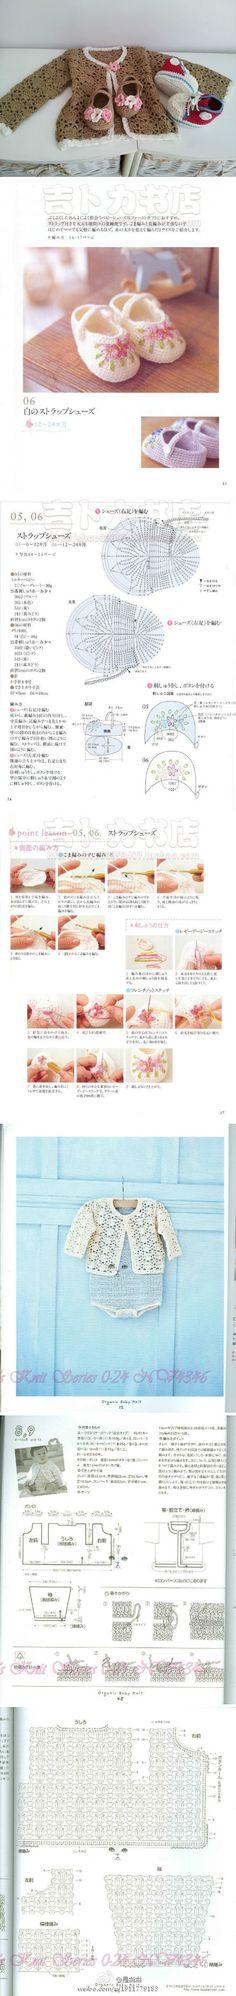 Crotchet Baby Combo Pattern